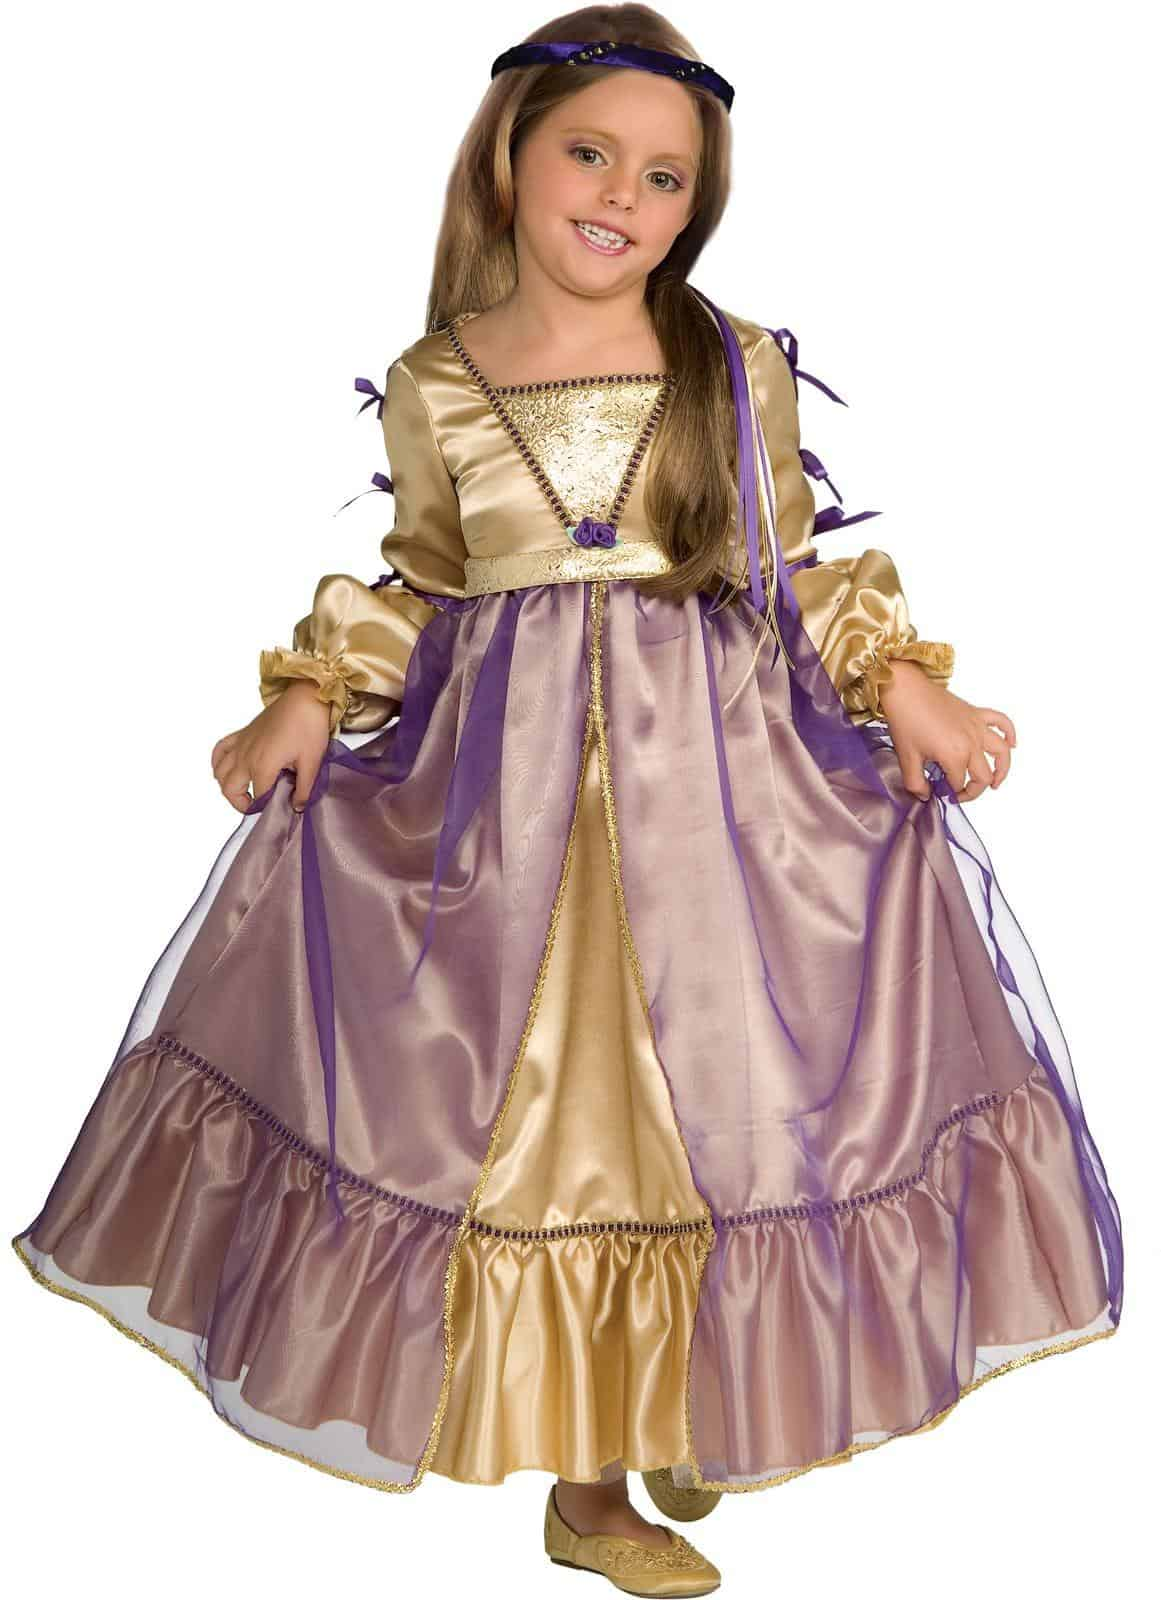 Princess Juliet Toddler Costume